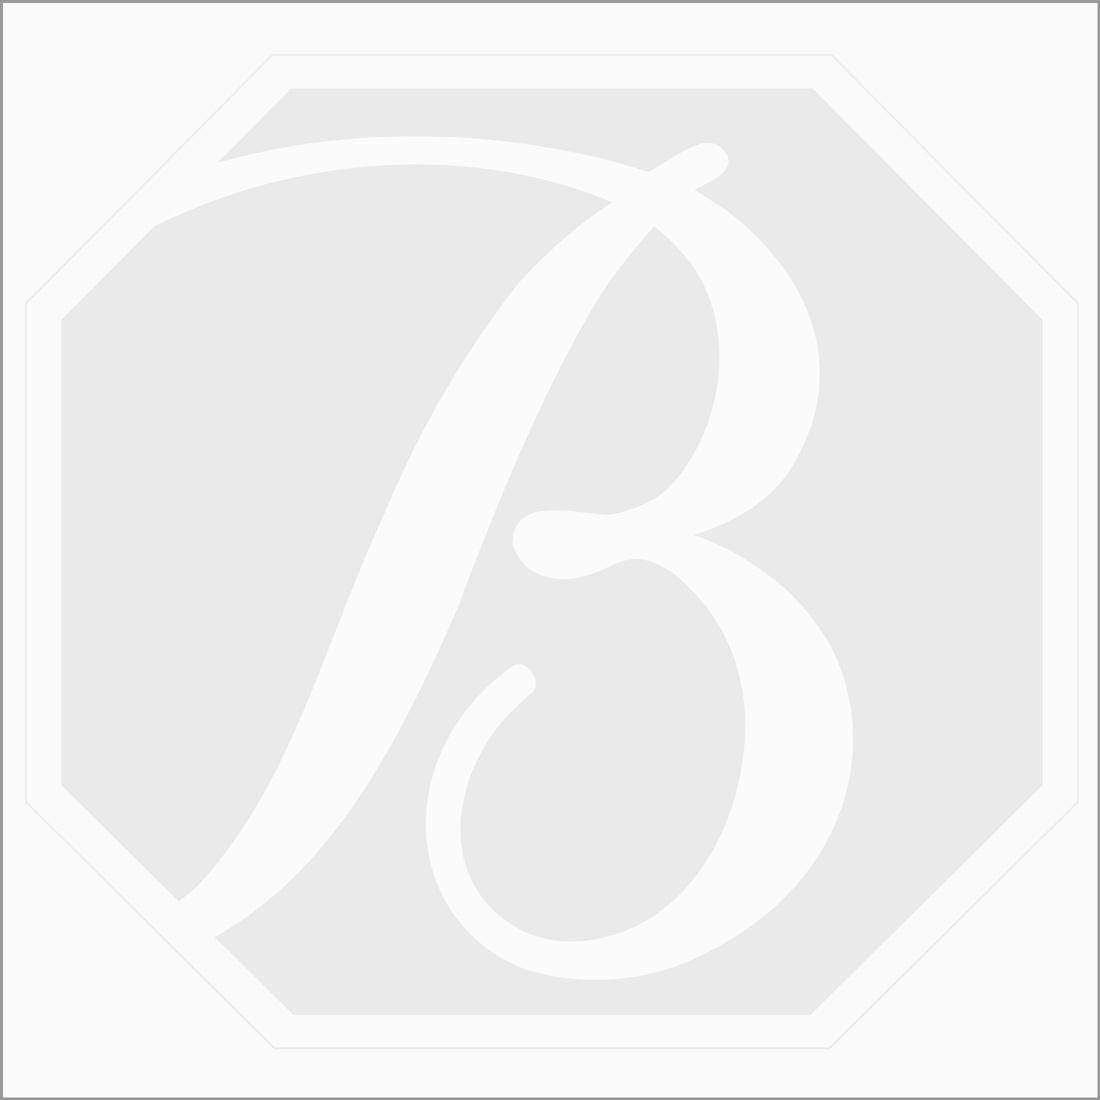 1 Pc - 69.30 ct. -Medium Blue Aquamarine Oval Cabochon - 33.7 x 20.3 x 14.2 mm (AQCAB1093)